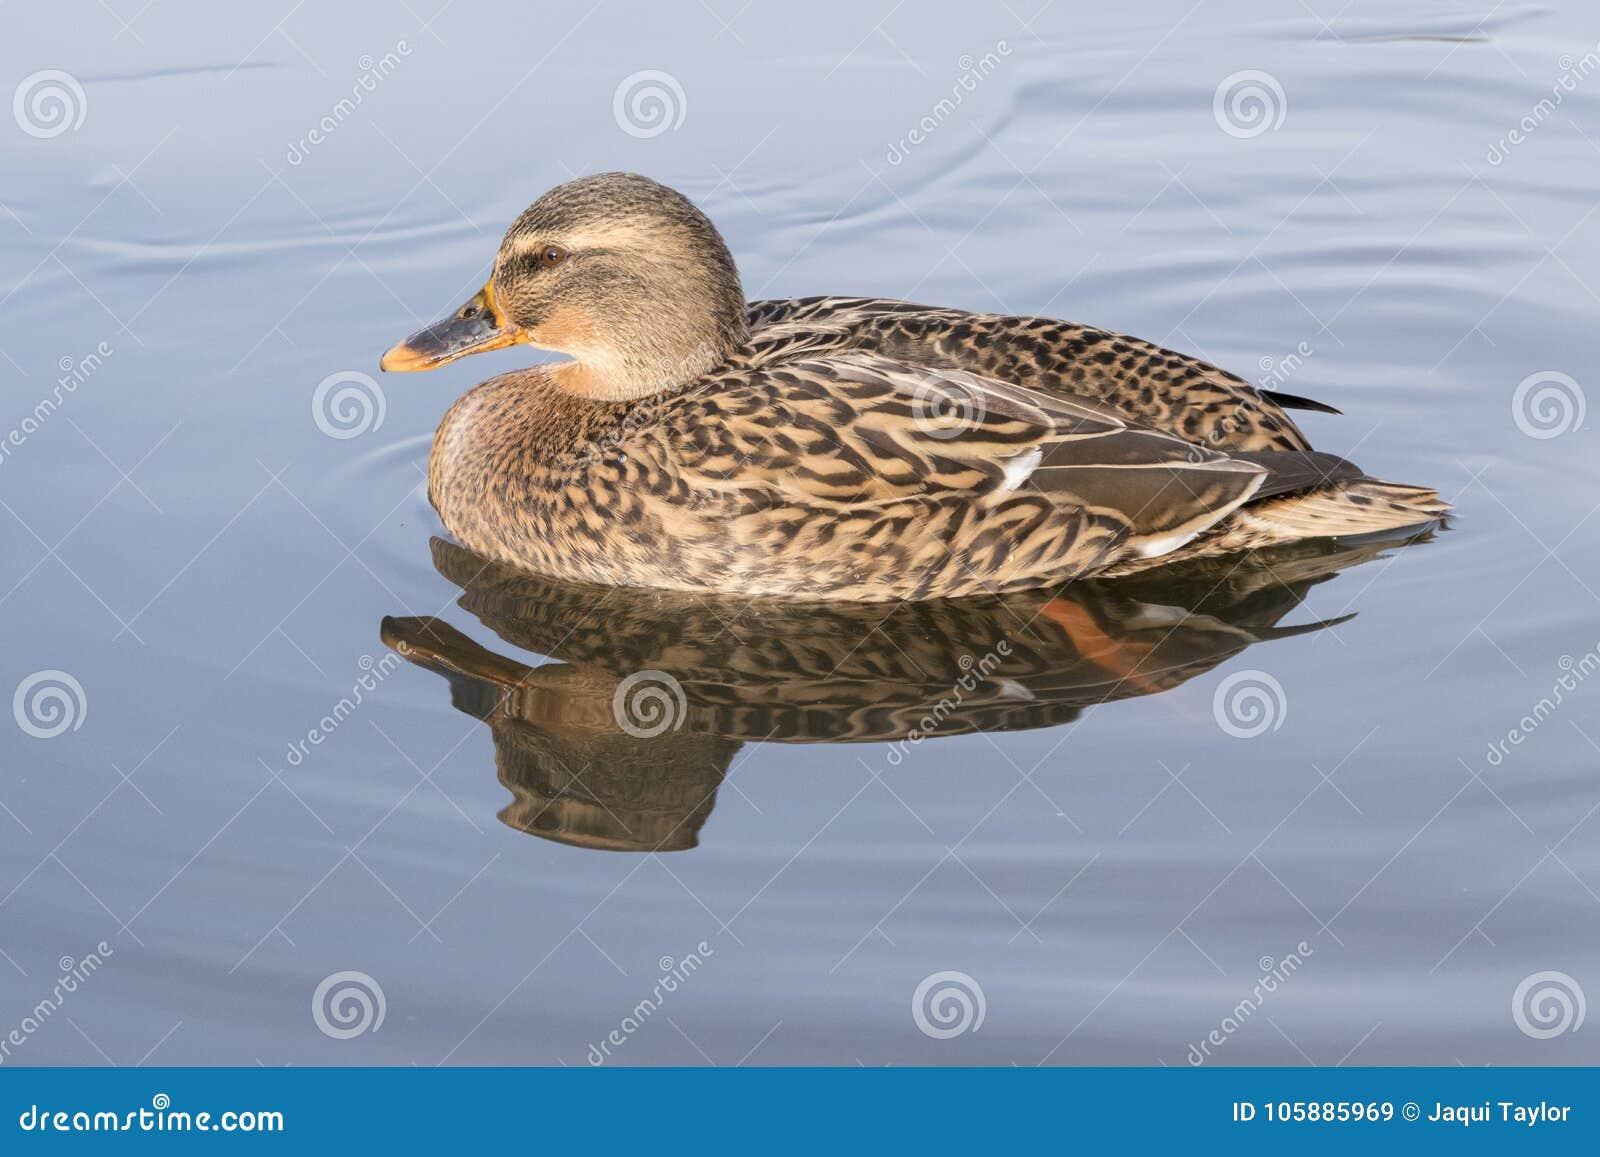 A mallard duck with reflection